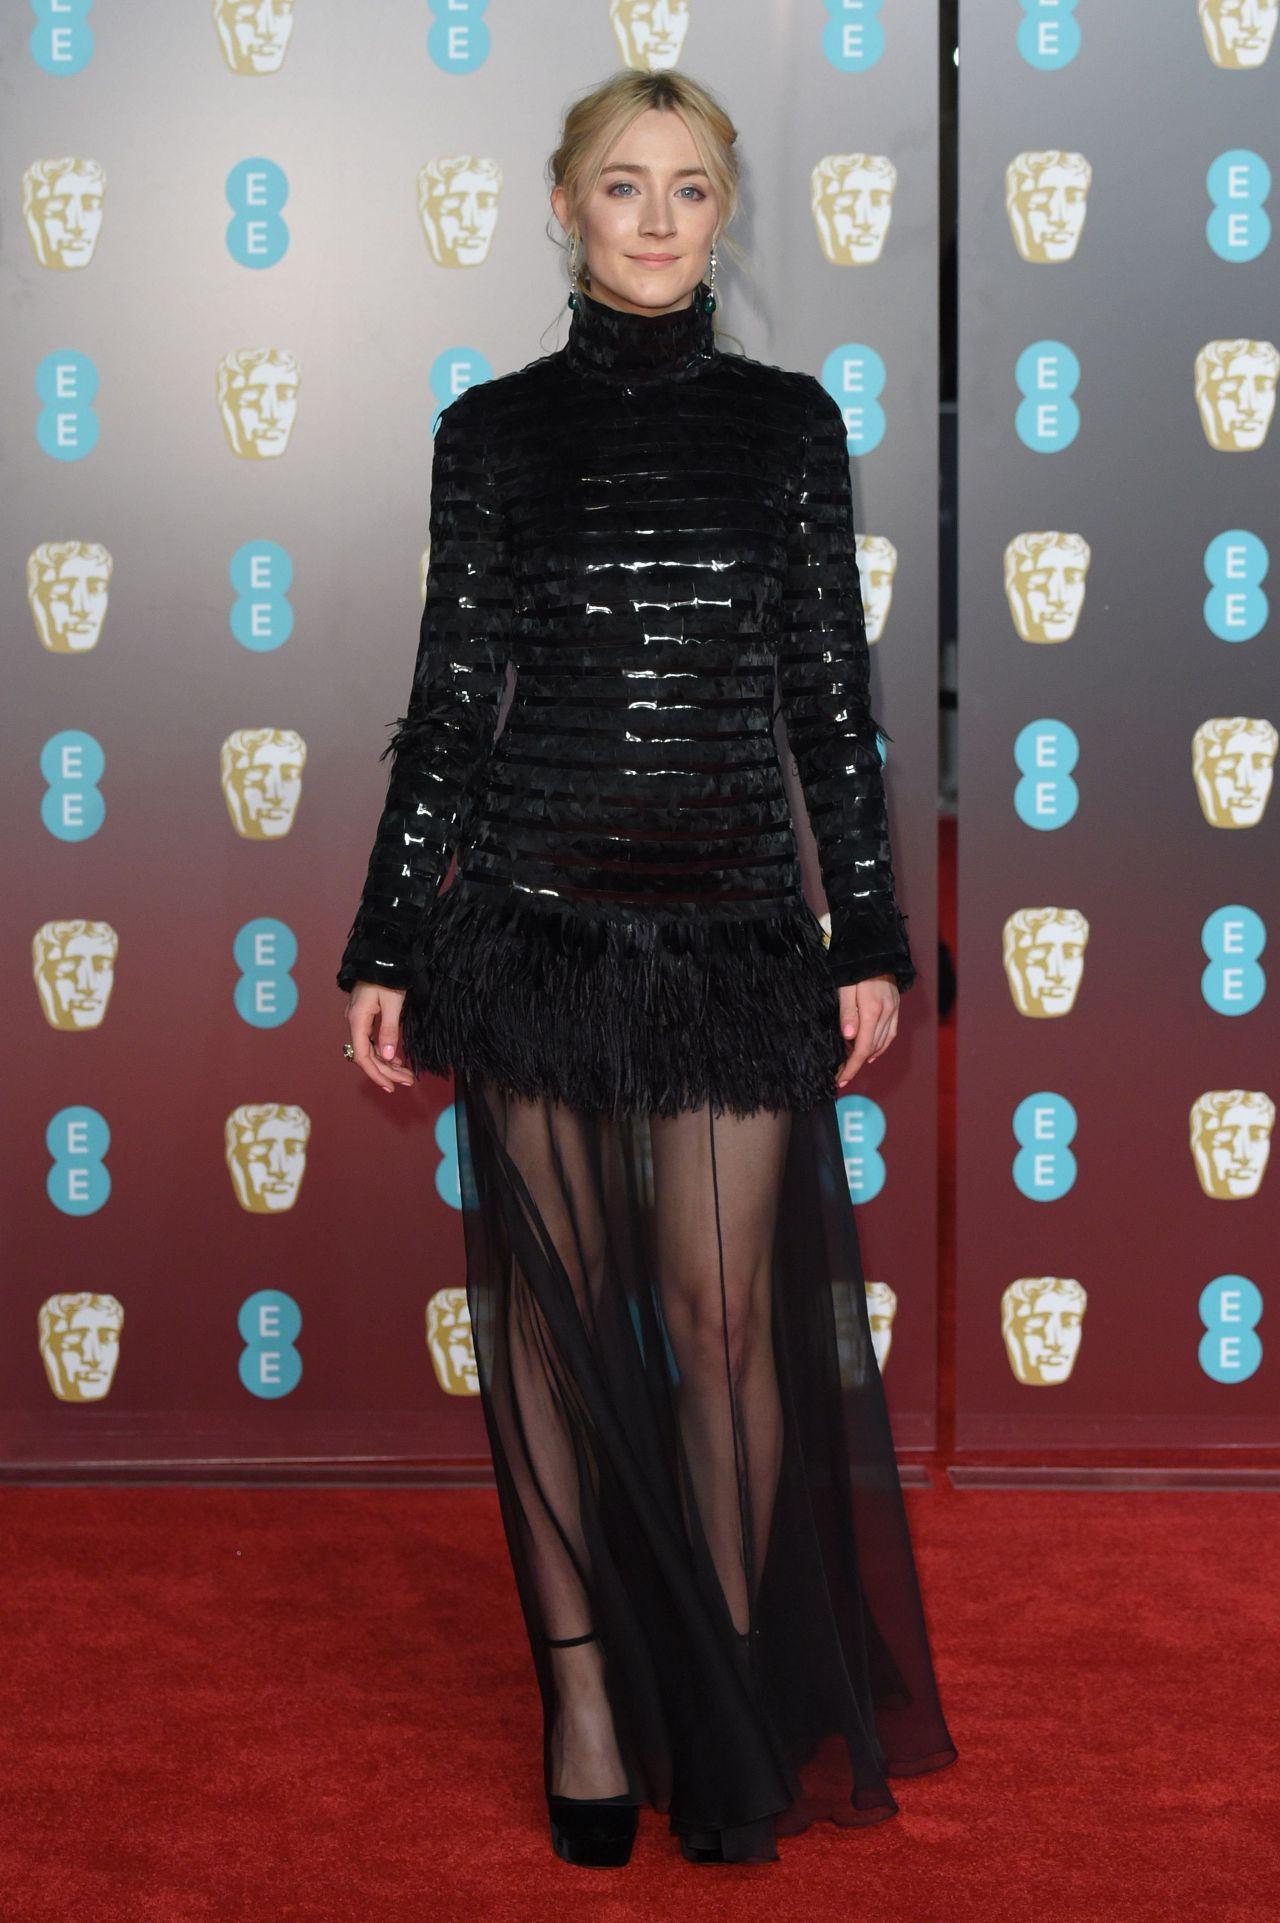 Saoirse Ronan 2018 British Academy Film Awards